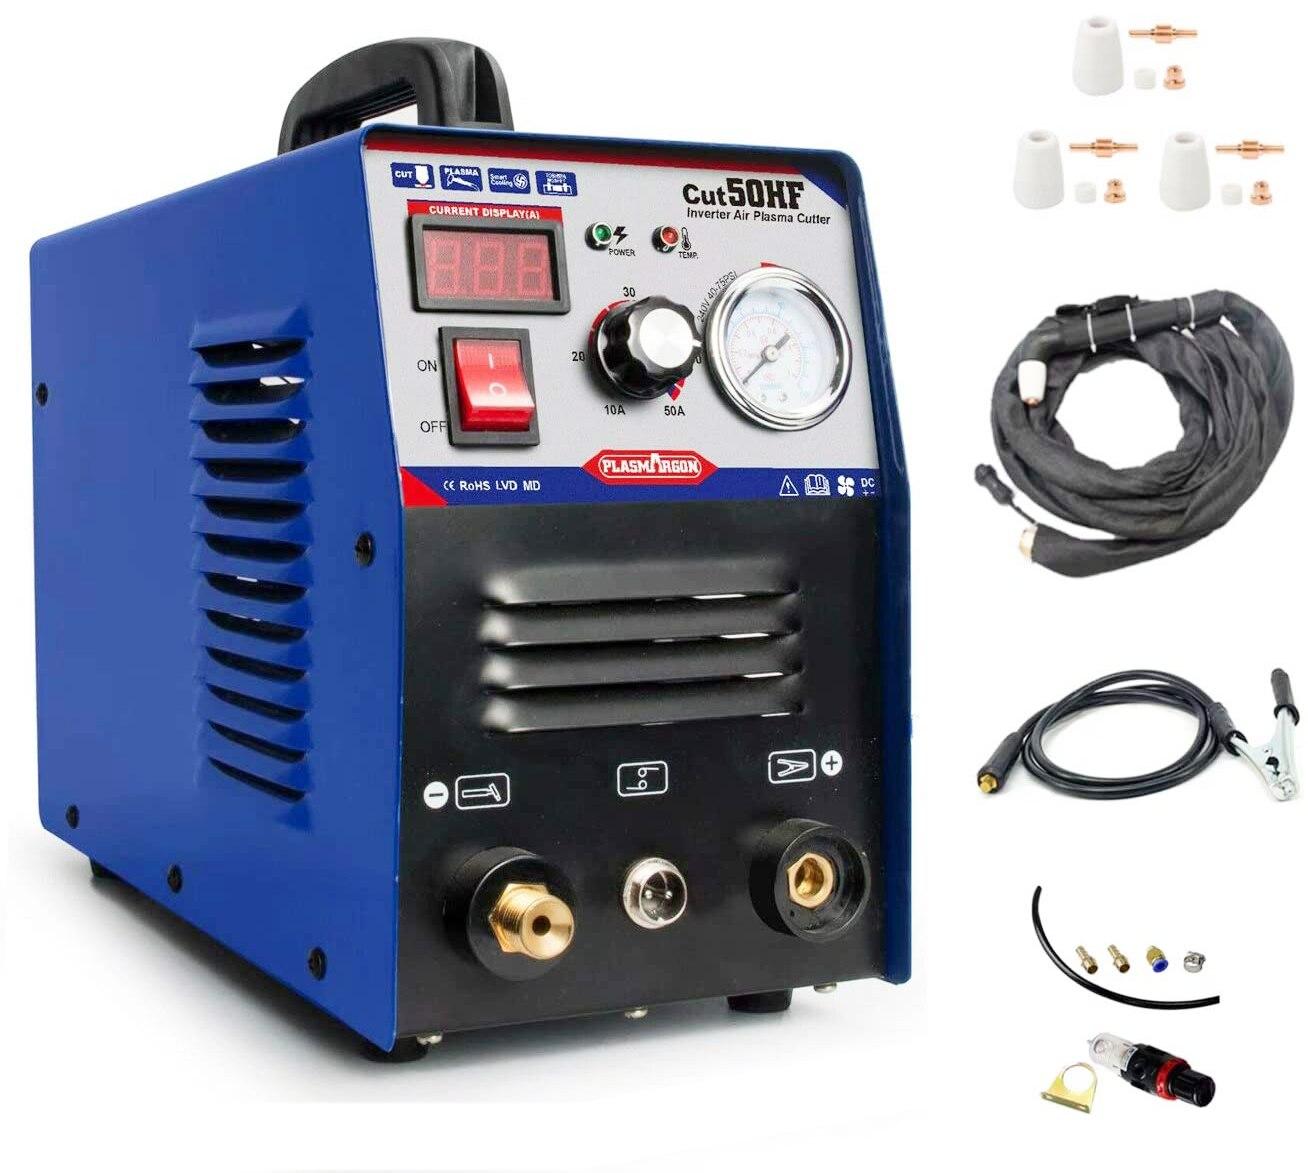 Air Plasma Cutter IGBT DC Inverter Digital Display 50A Cut  DIY Tool 110-220v